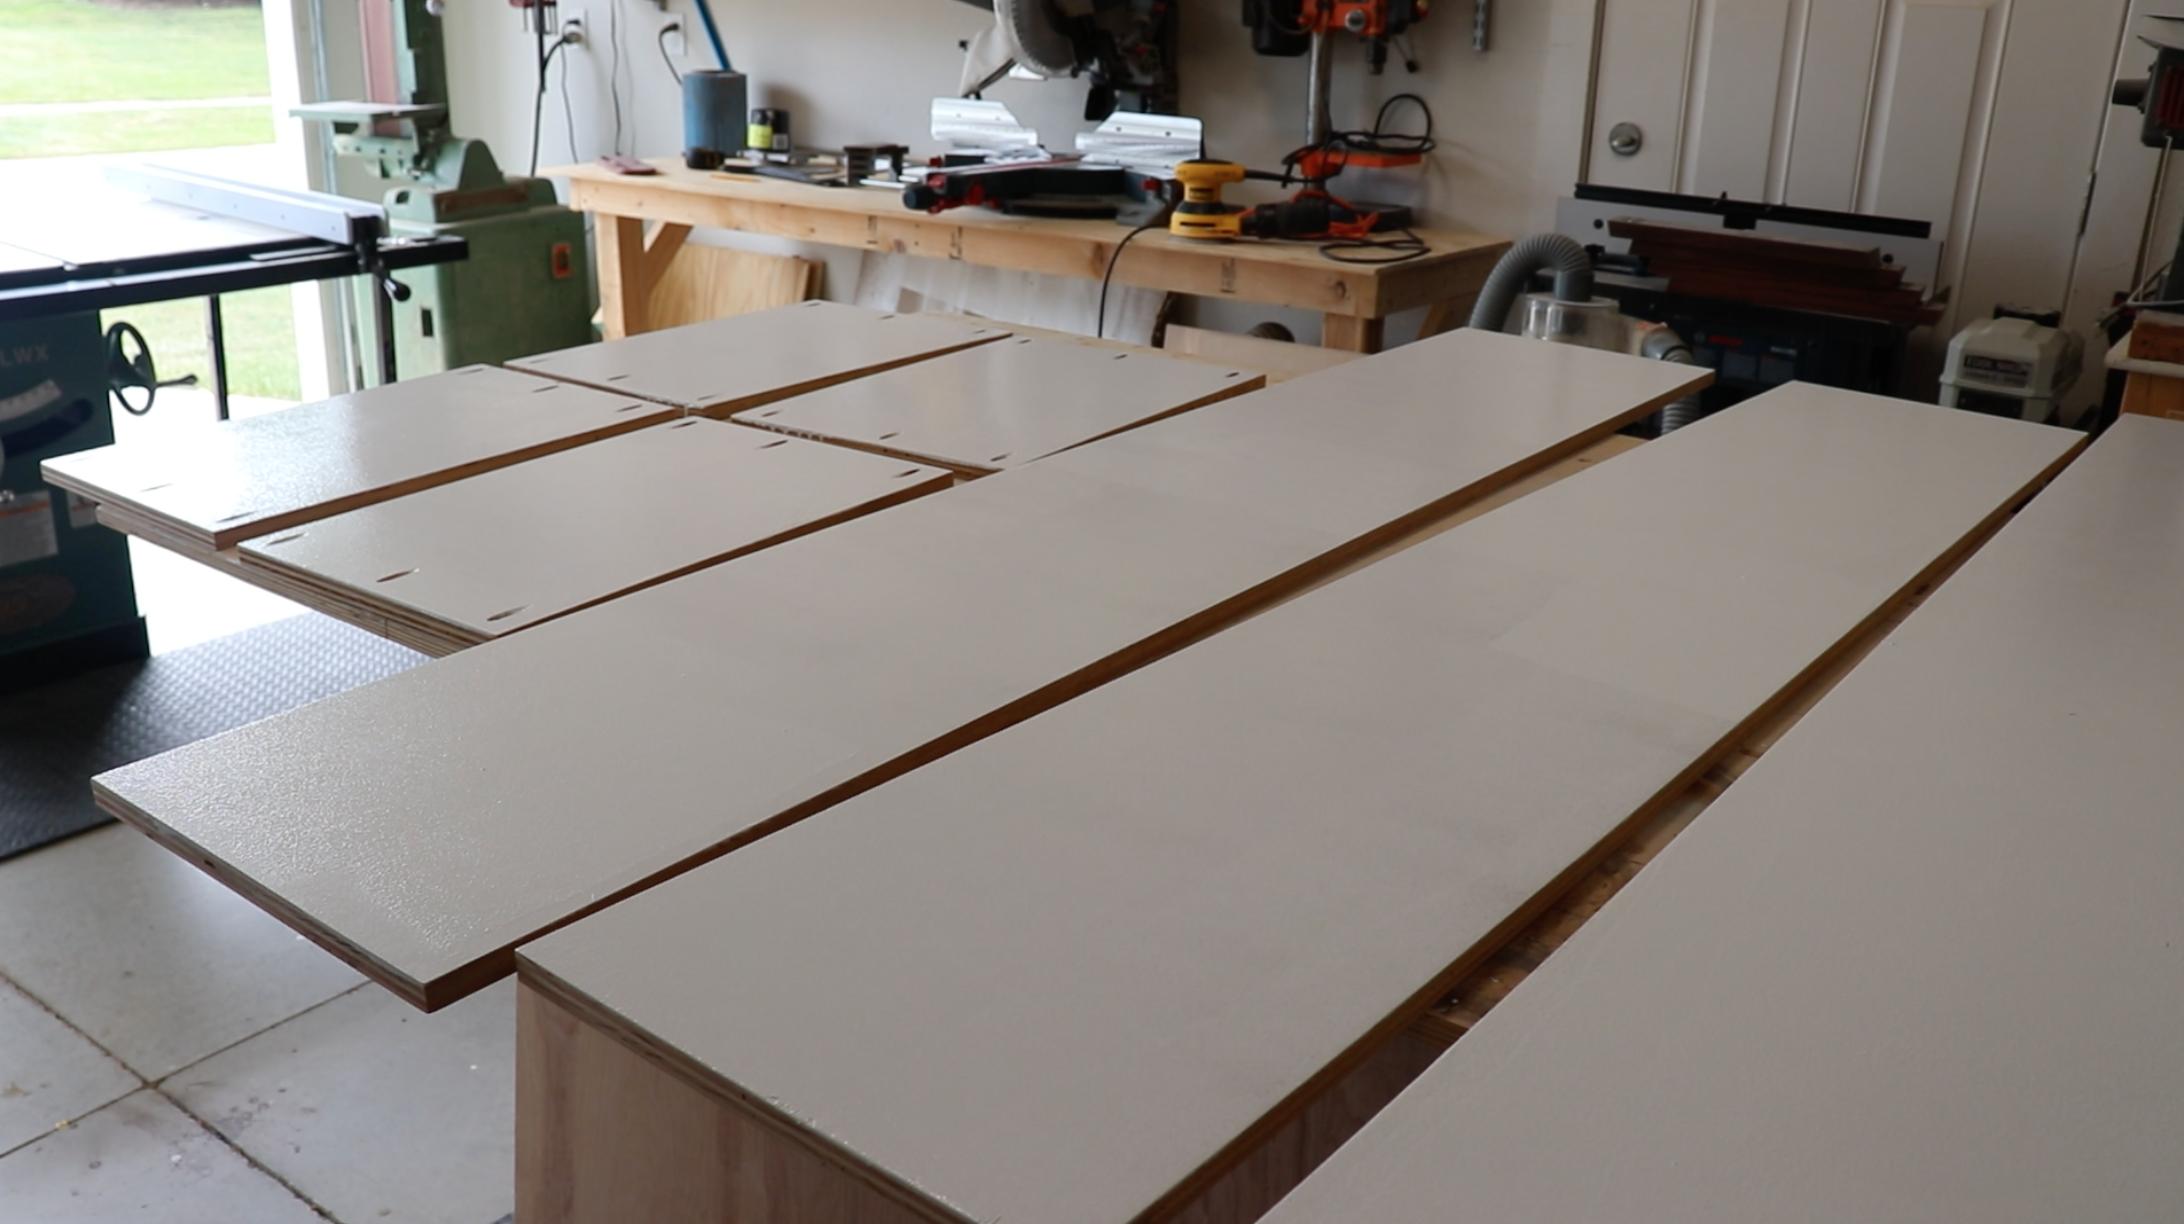 Painting Custom Closet Shelves - Birch Plywood